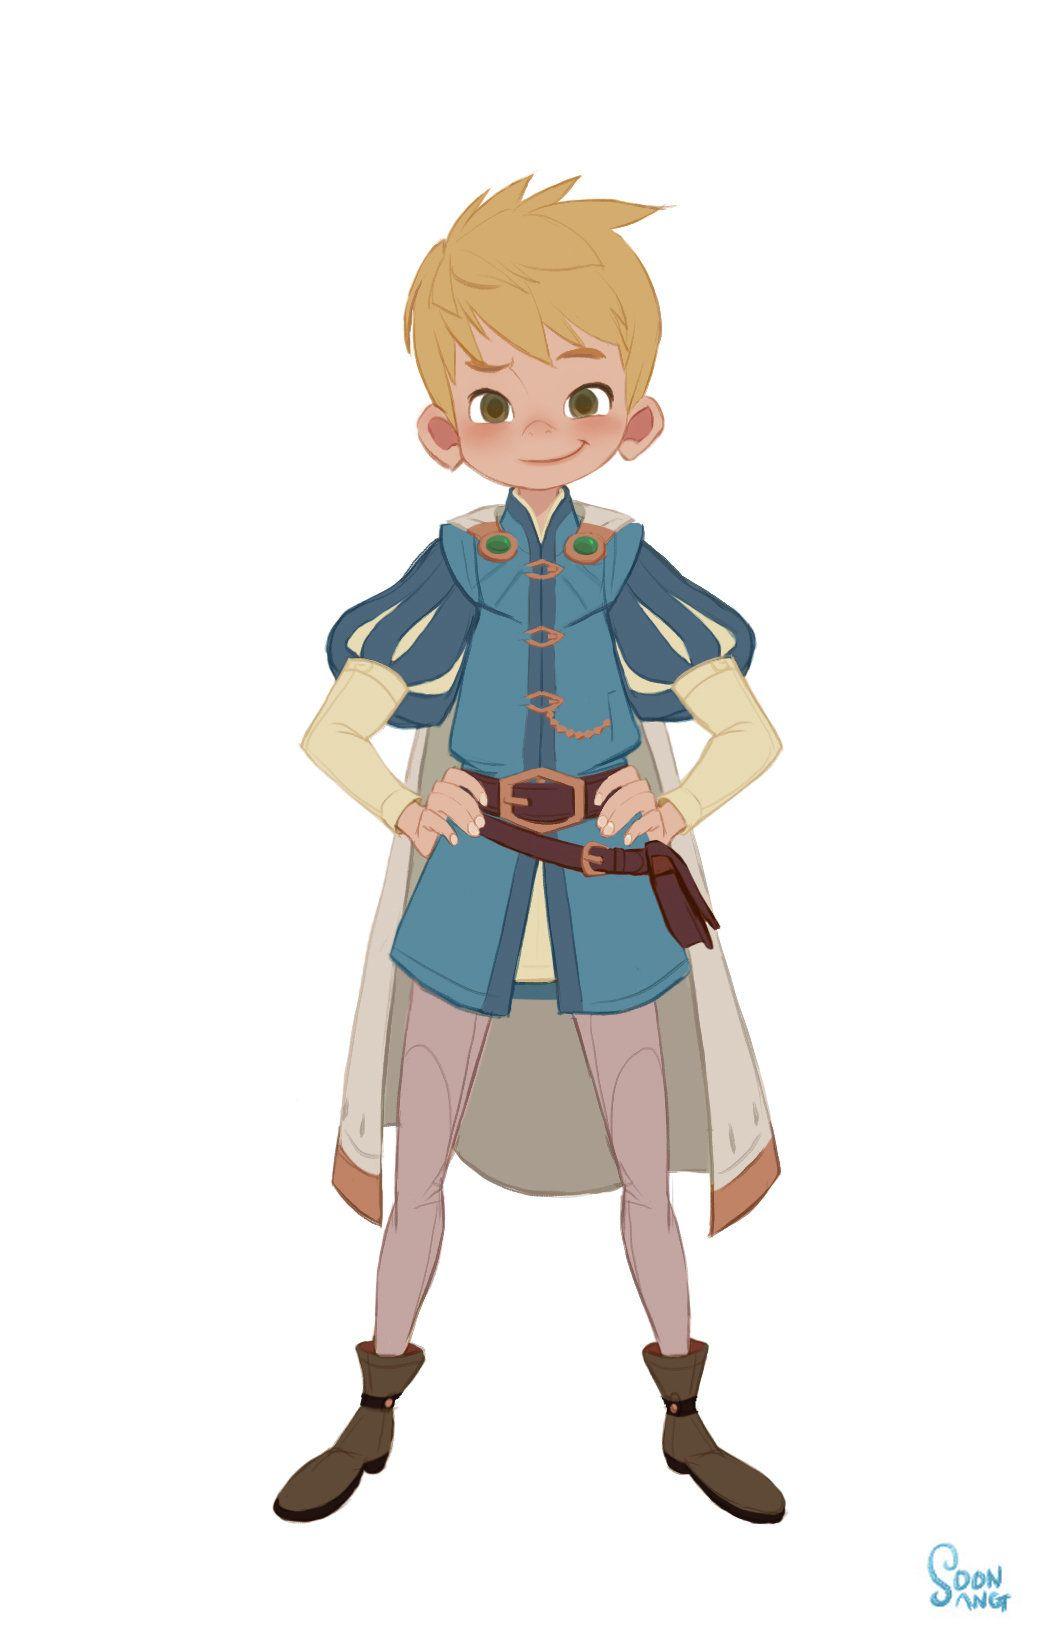 Pin de Javier Alcalde en Characters. Medieval Fantasy. | Pinterest ...